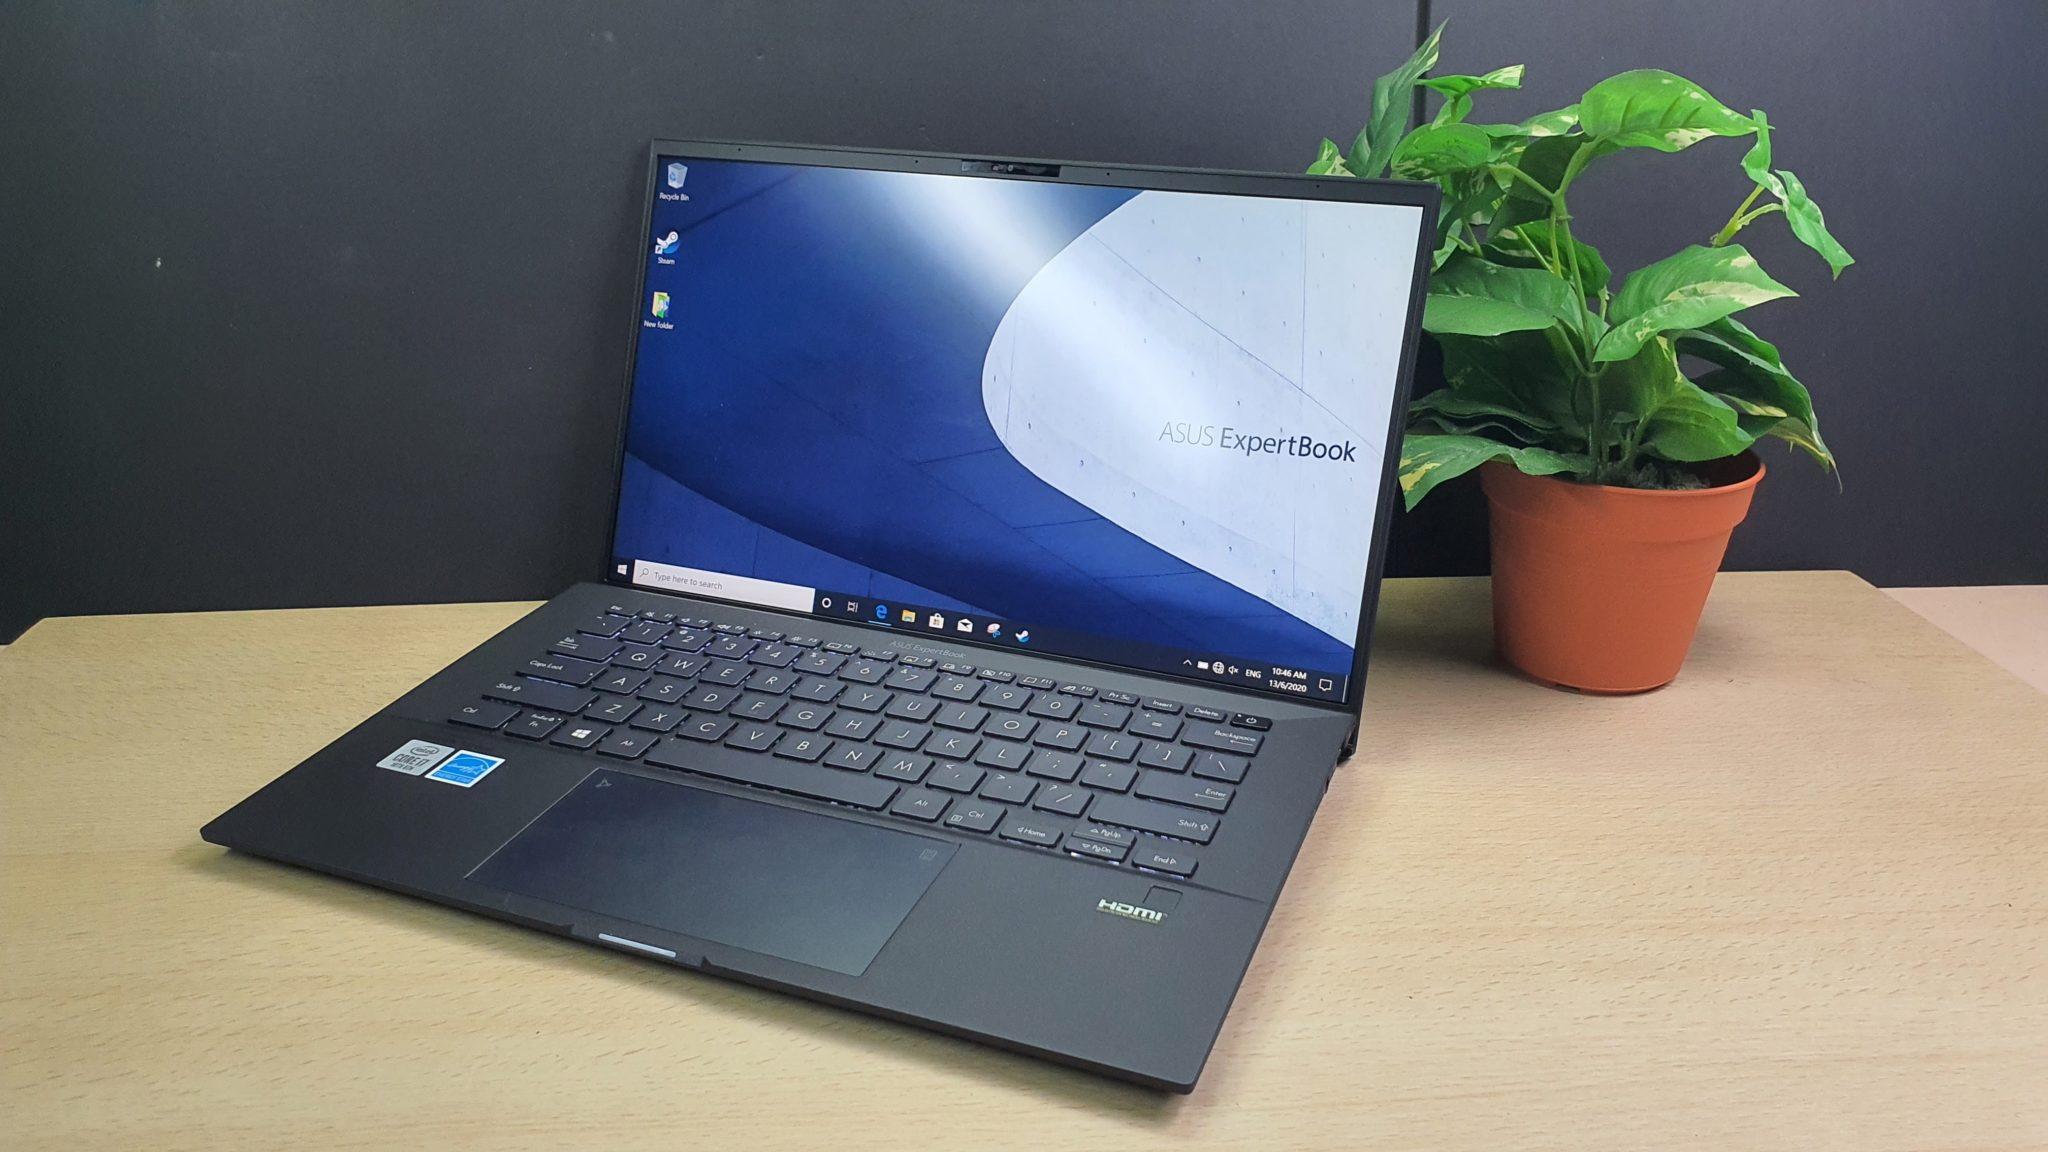 Asus ExpertBook B9 (B9450) front